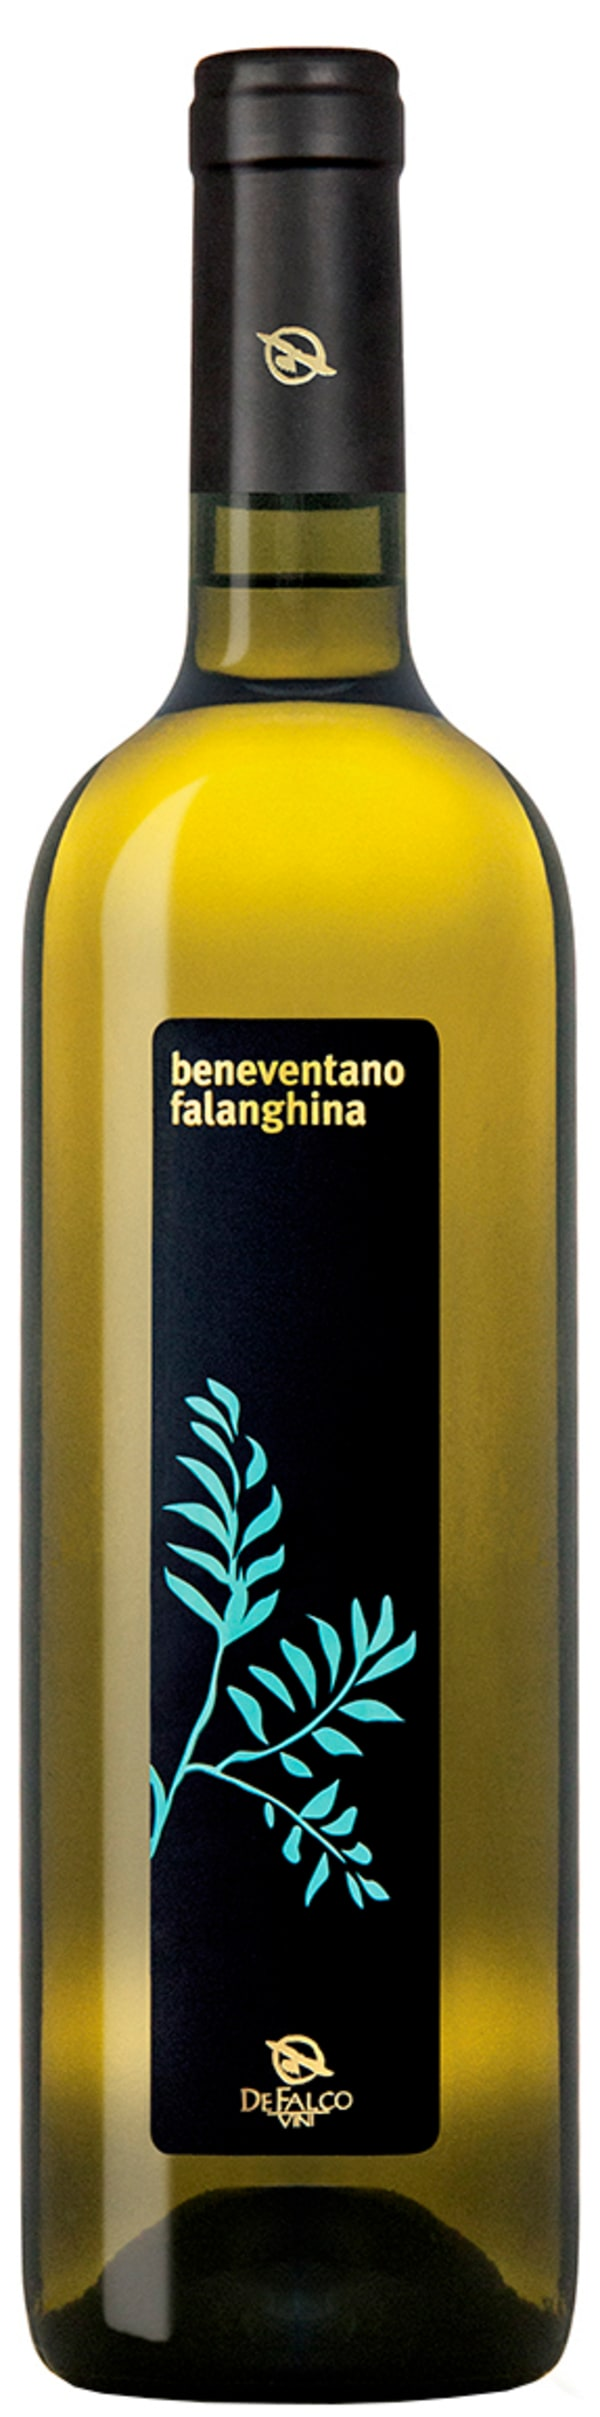 De Falco Beneventano Falanghina